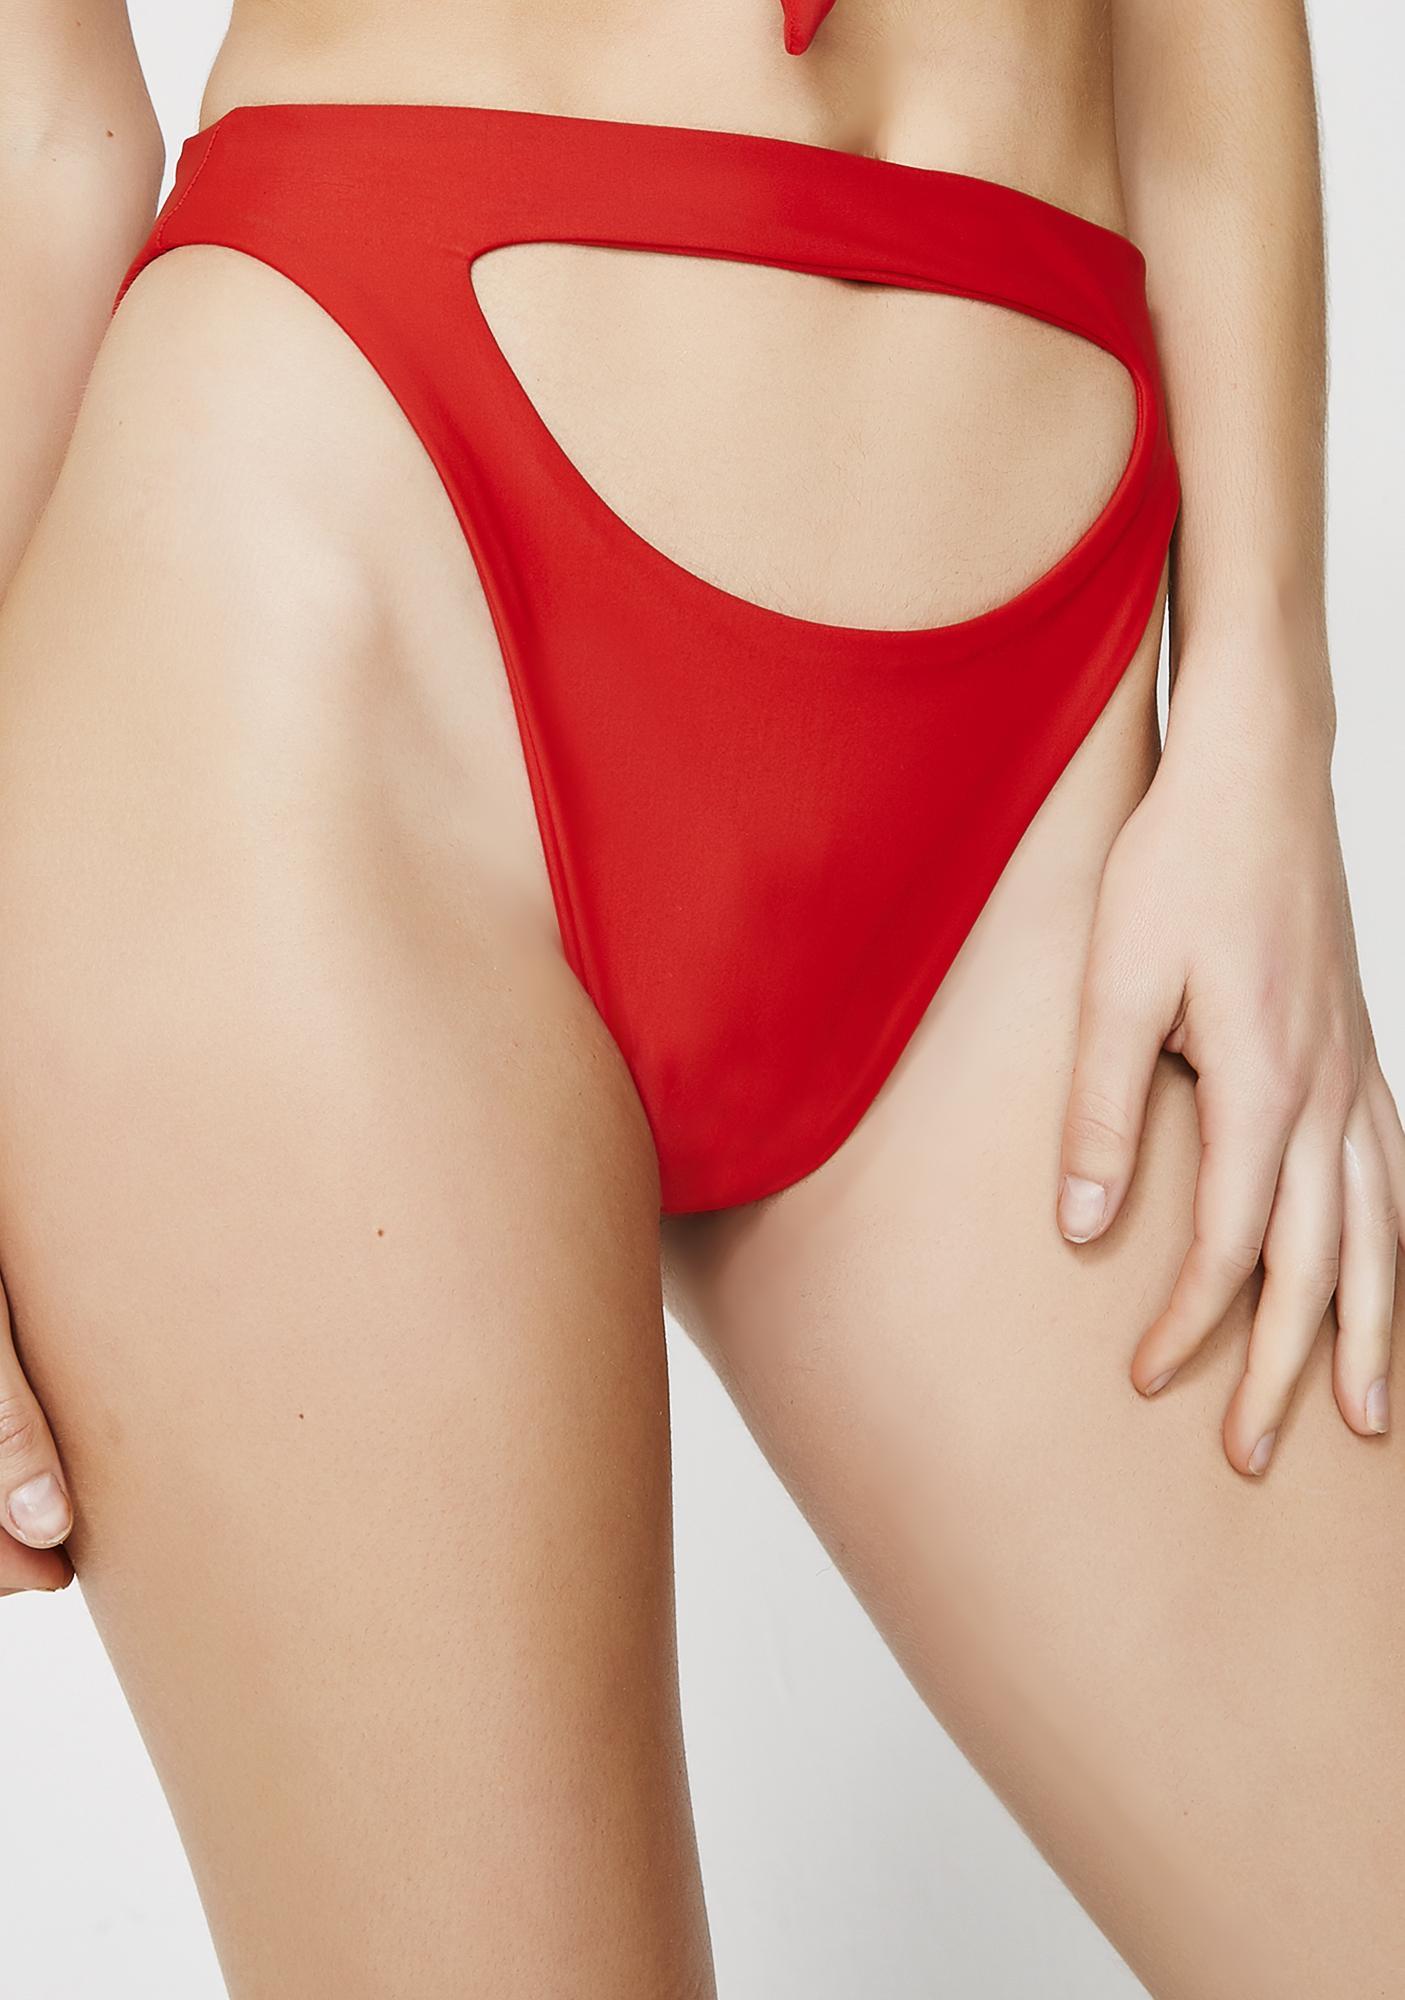 Lee + Lani Offshore Bikini Bottoms